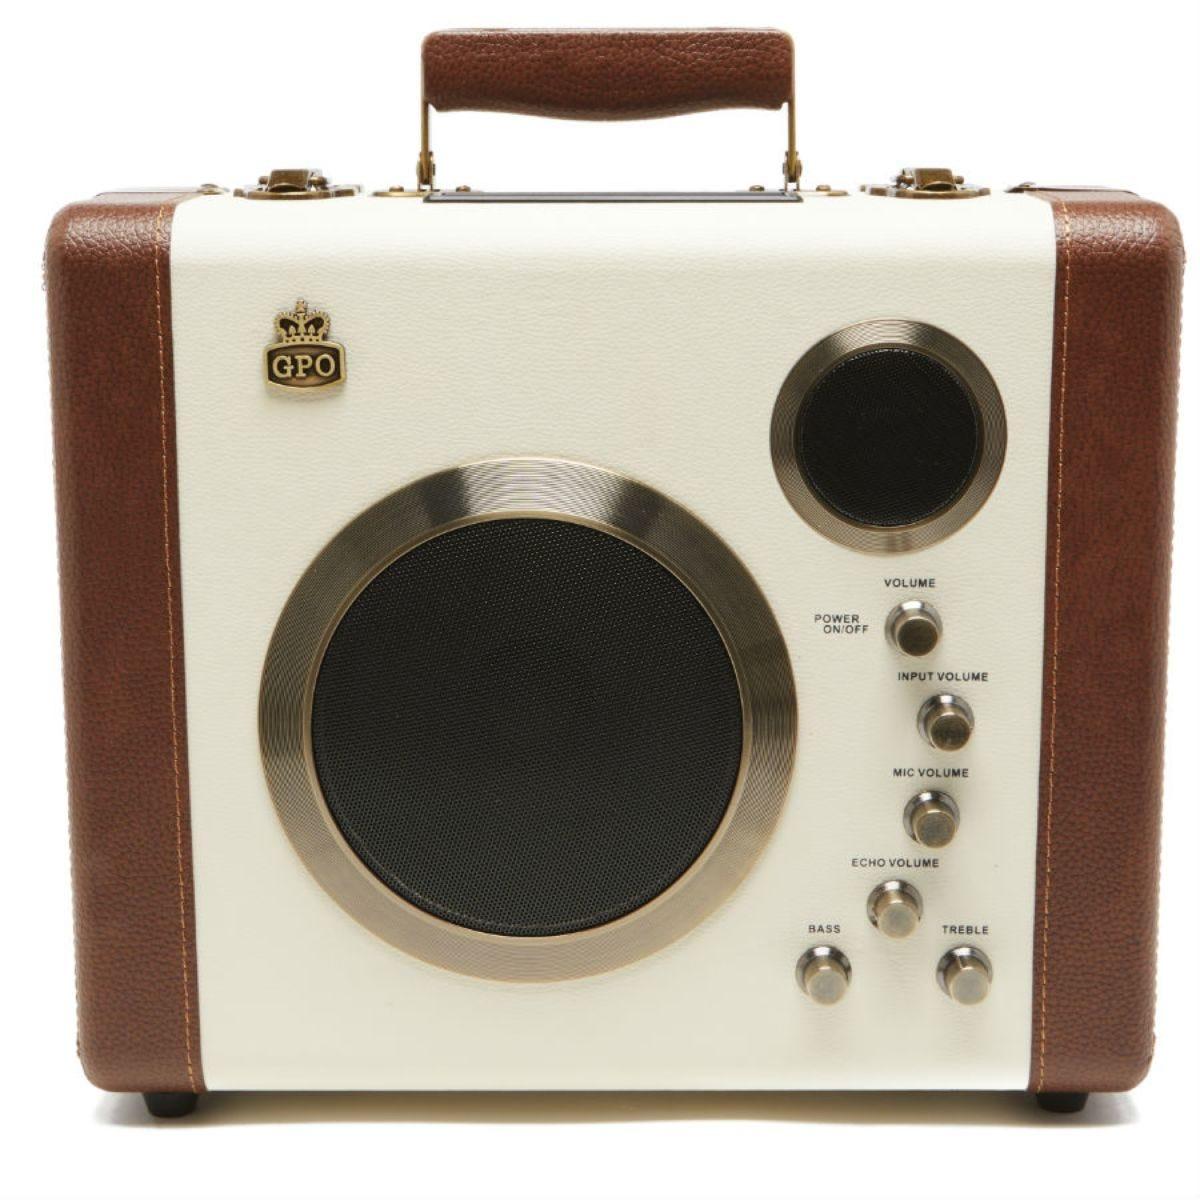 GPO Retro Manga Bluetooth Speaker & Amplifier System - Cream / Tan